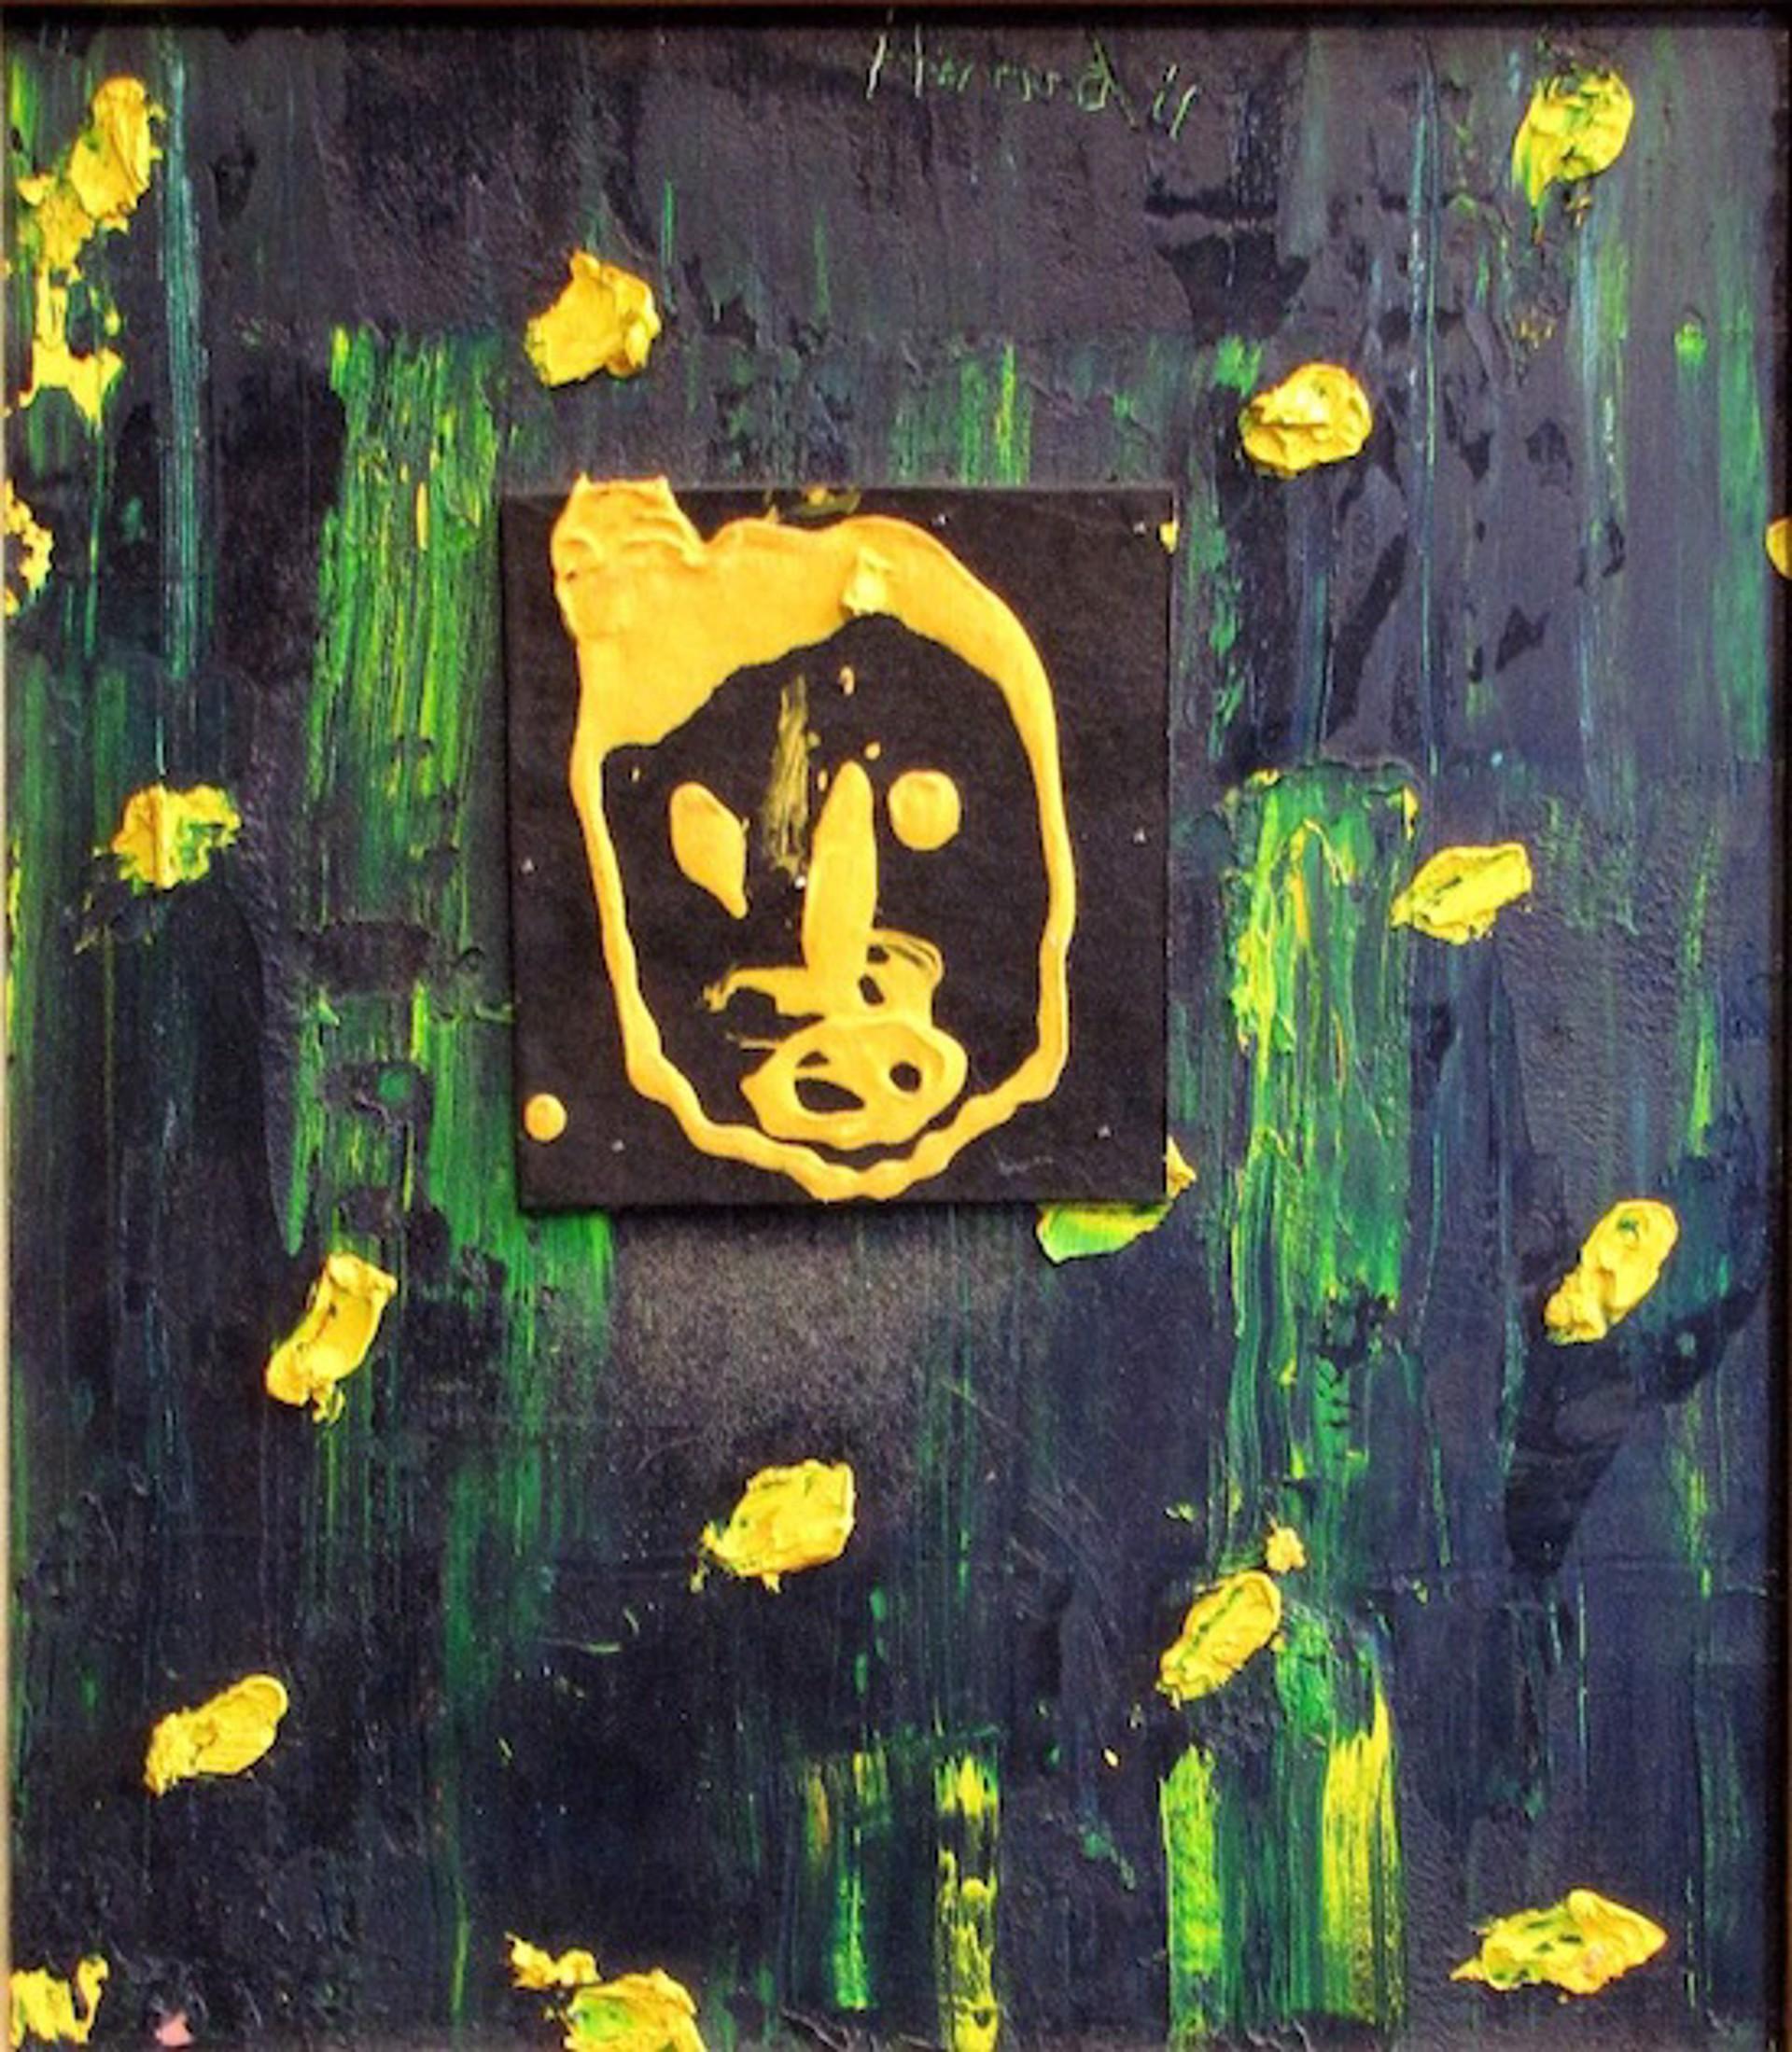 Yellow Felt Face on Green by James Havard